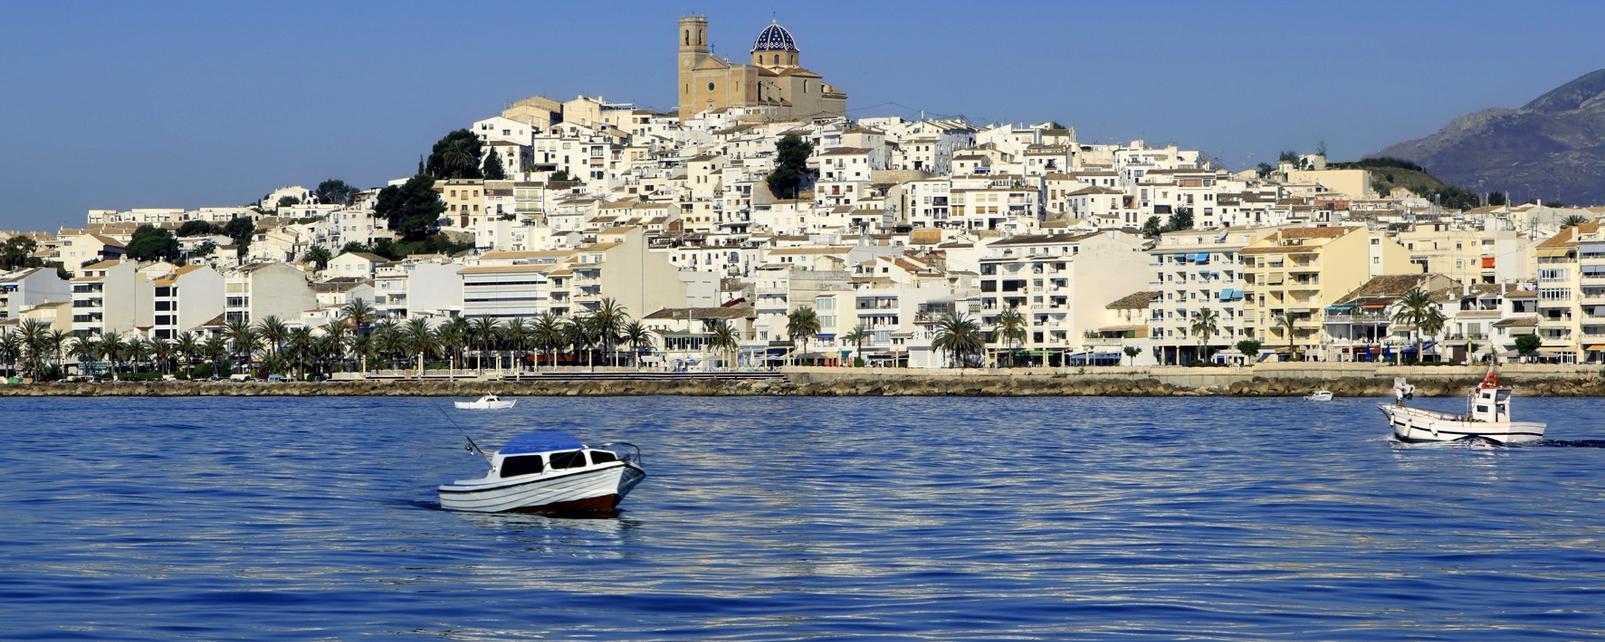 Europe; Espagne; Communauté de Valence; Alicante;